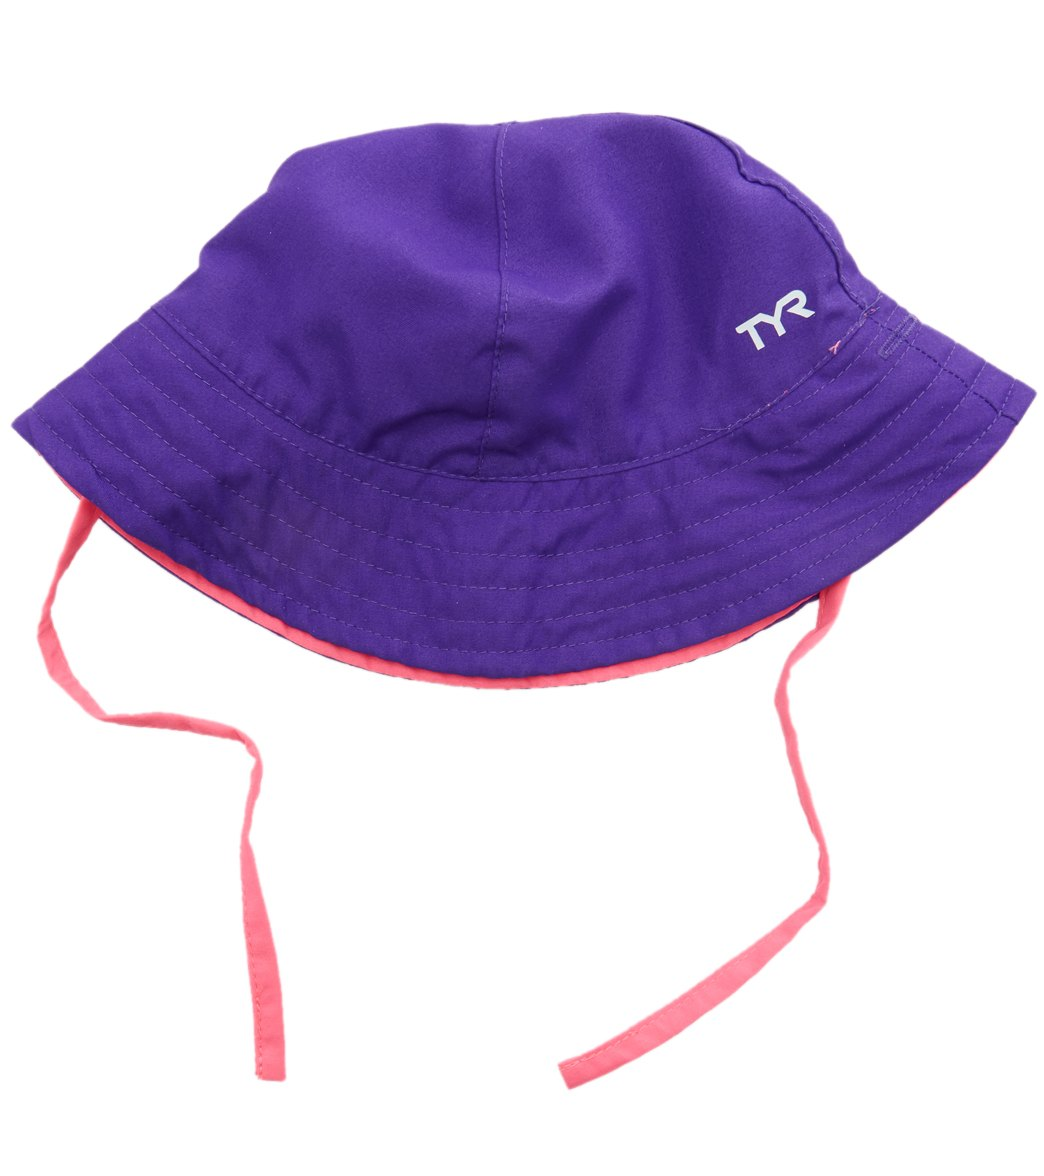 Wallaroo Childrens Surf Sun Hat Reversible UPF 50+